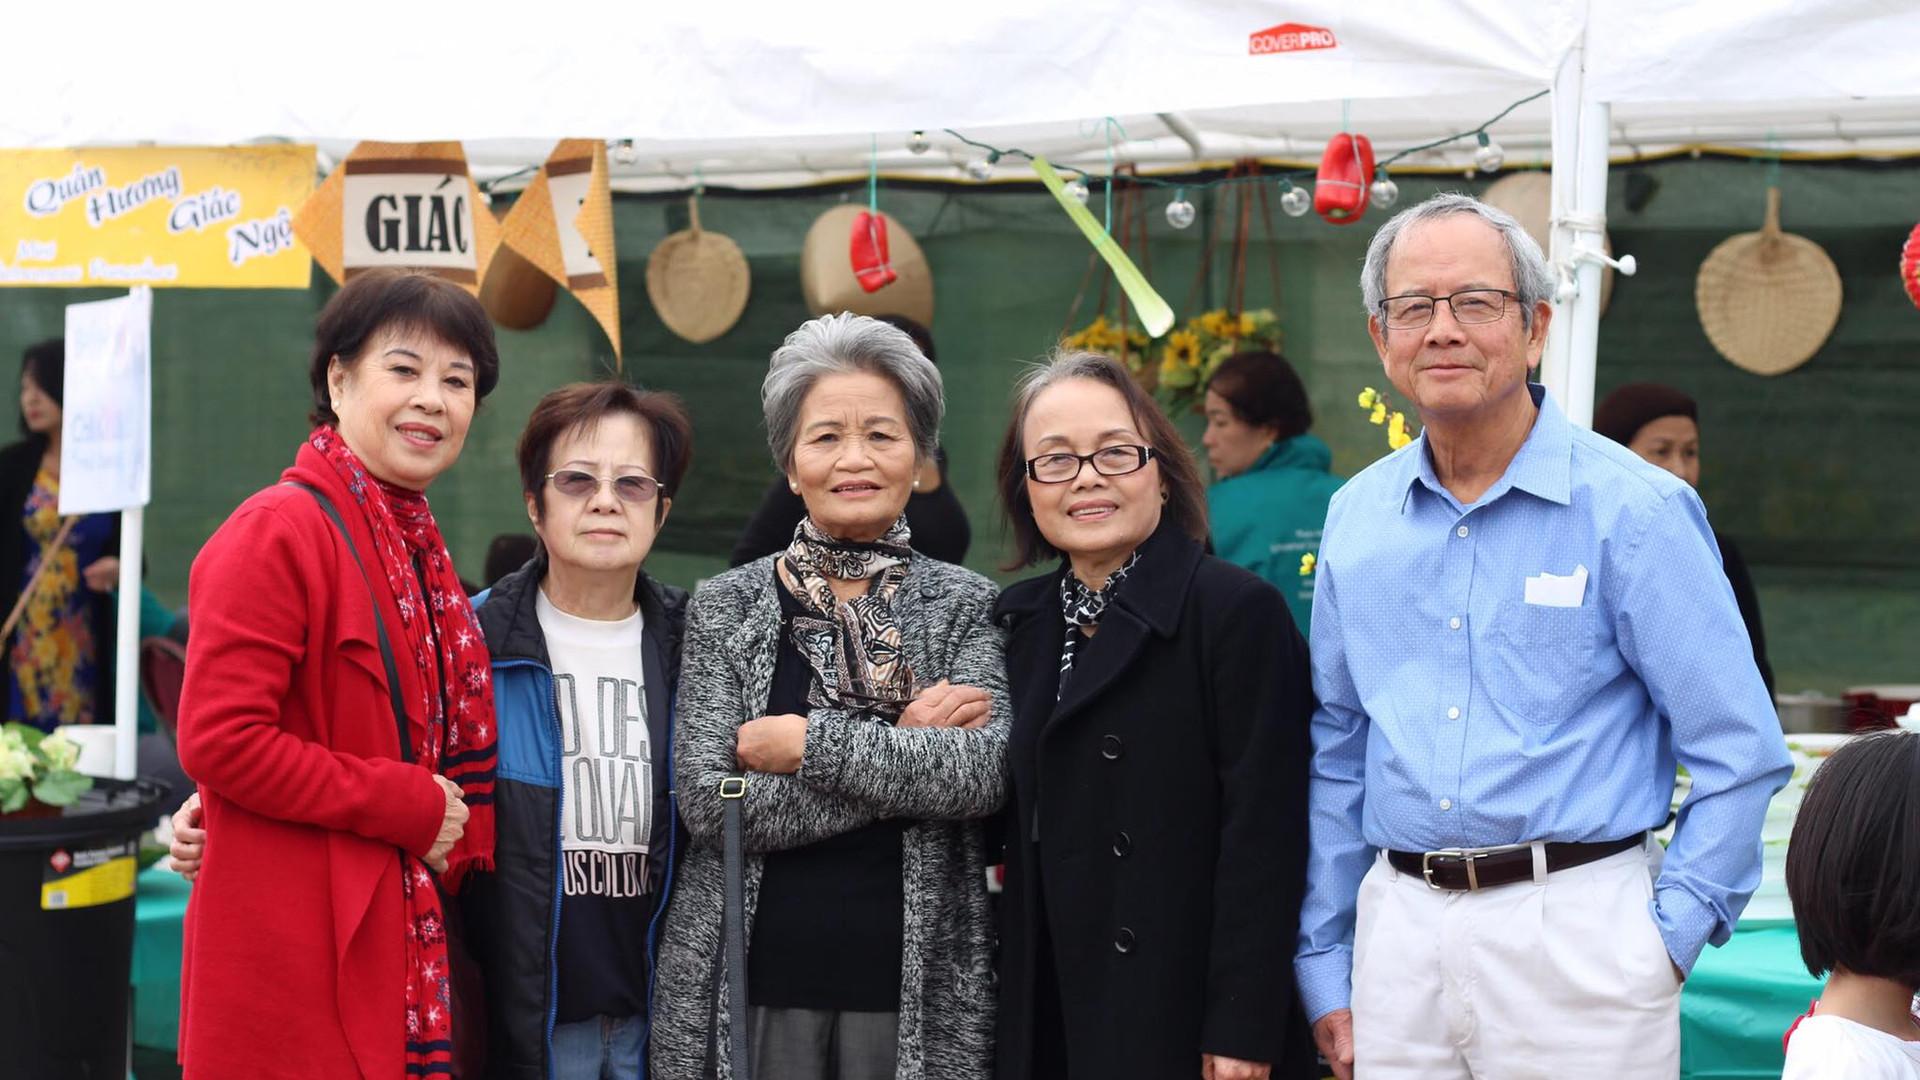 Hoi Xuan Giac Ngo 2018 49.jpg